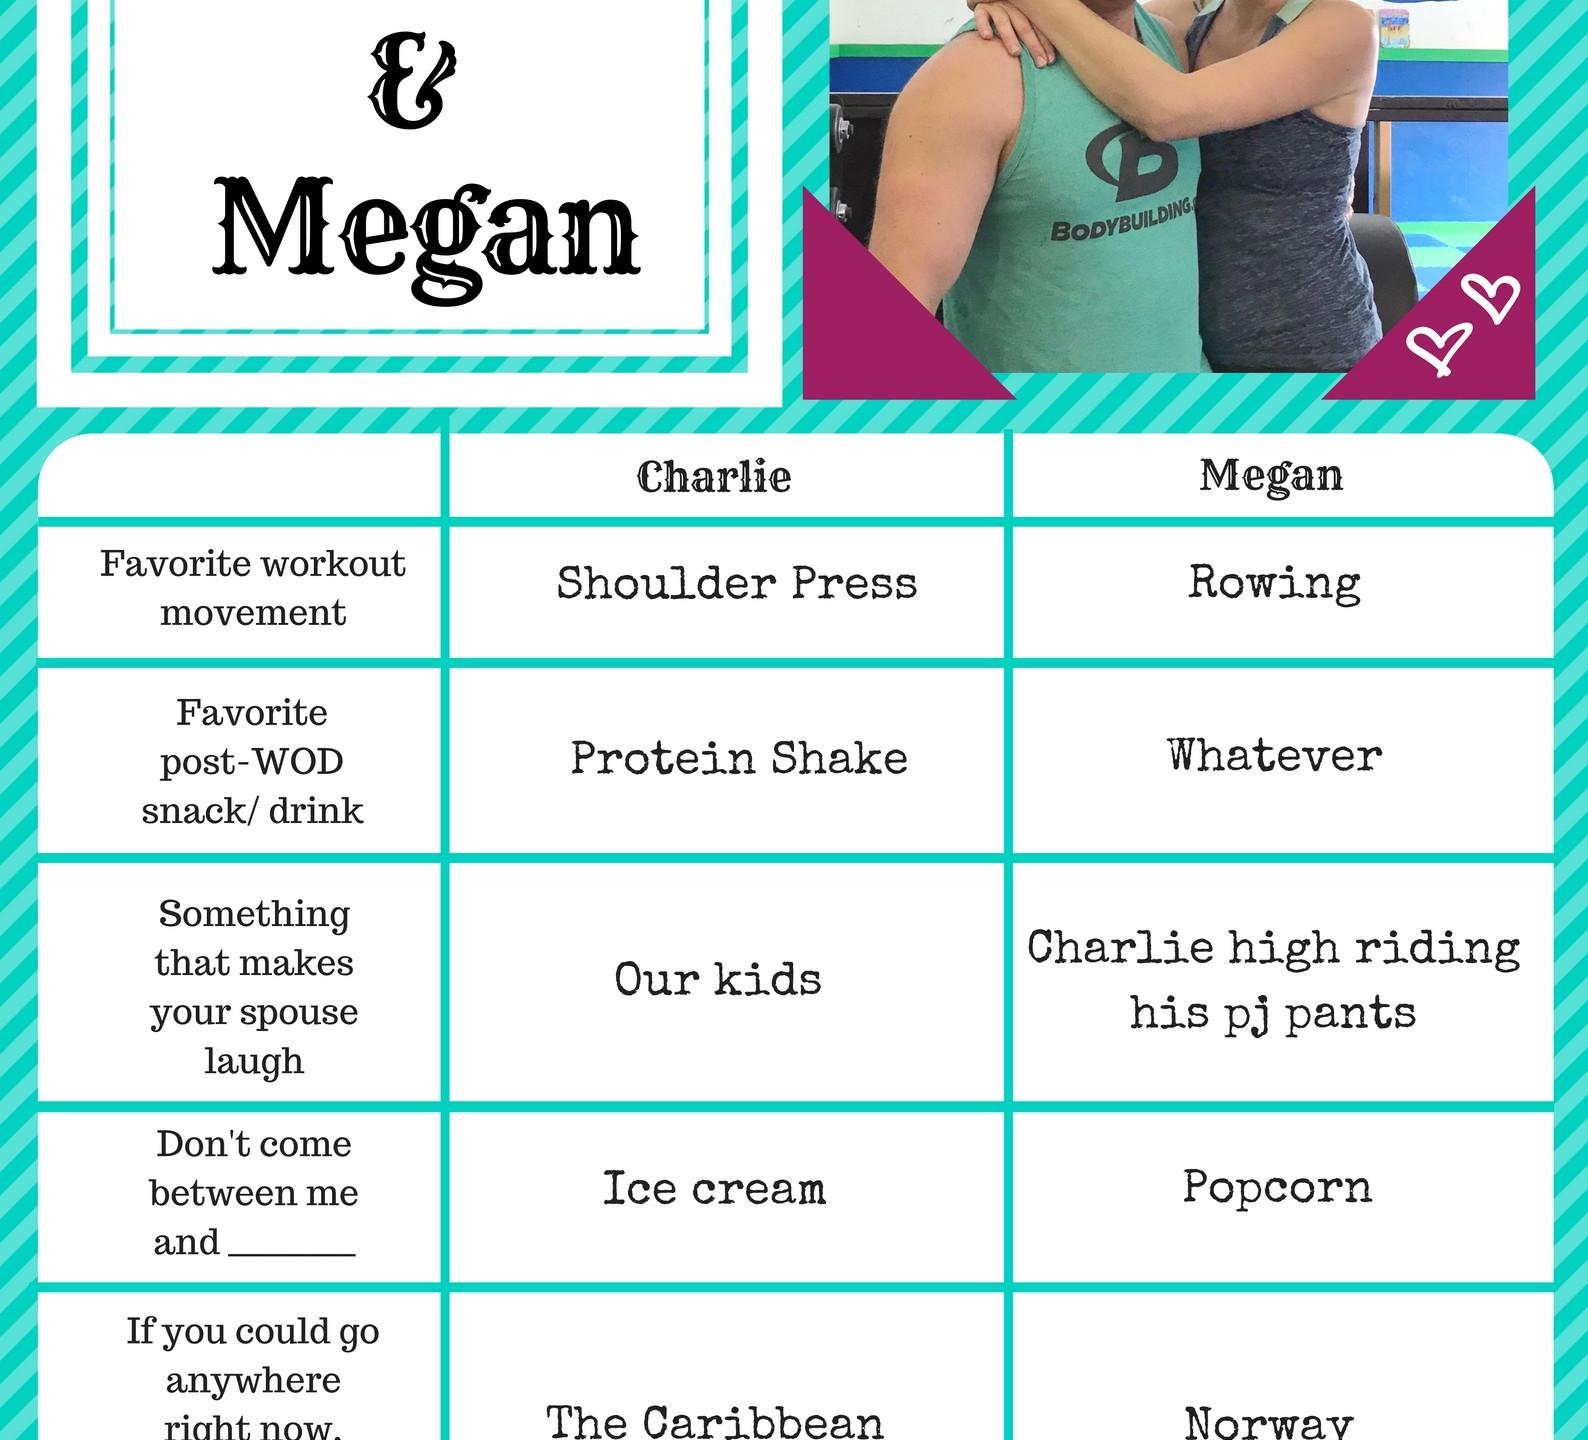 Charlie and Megan